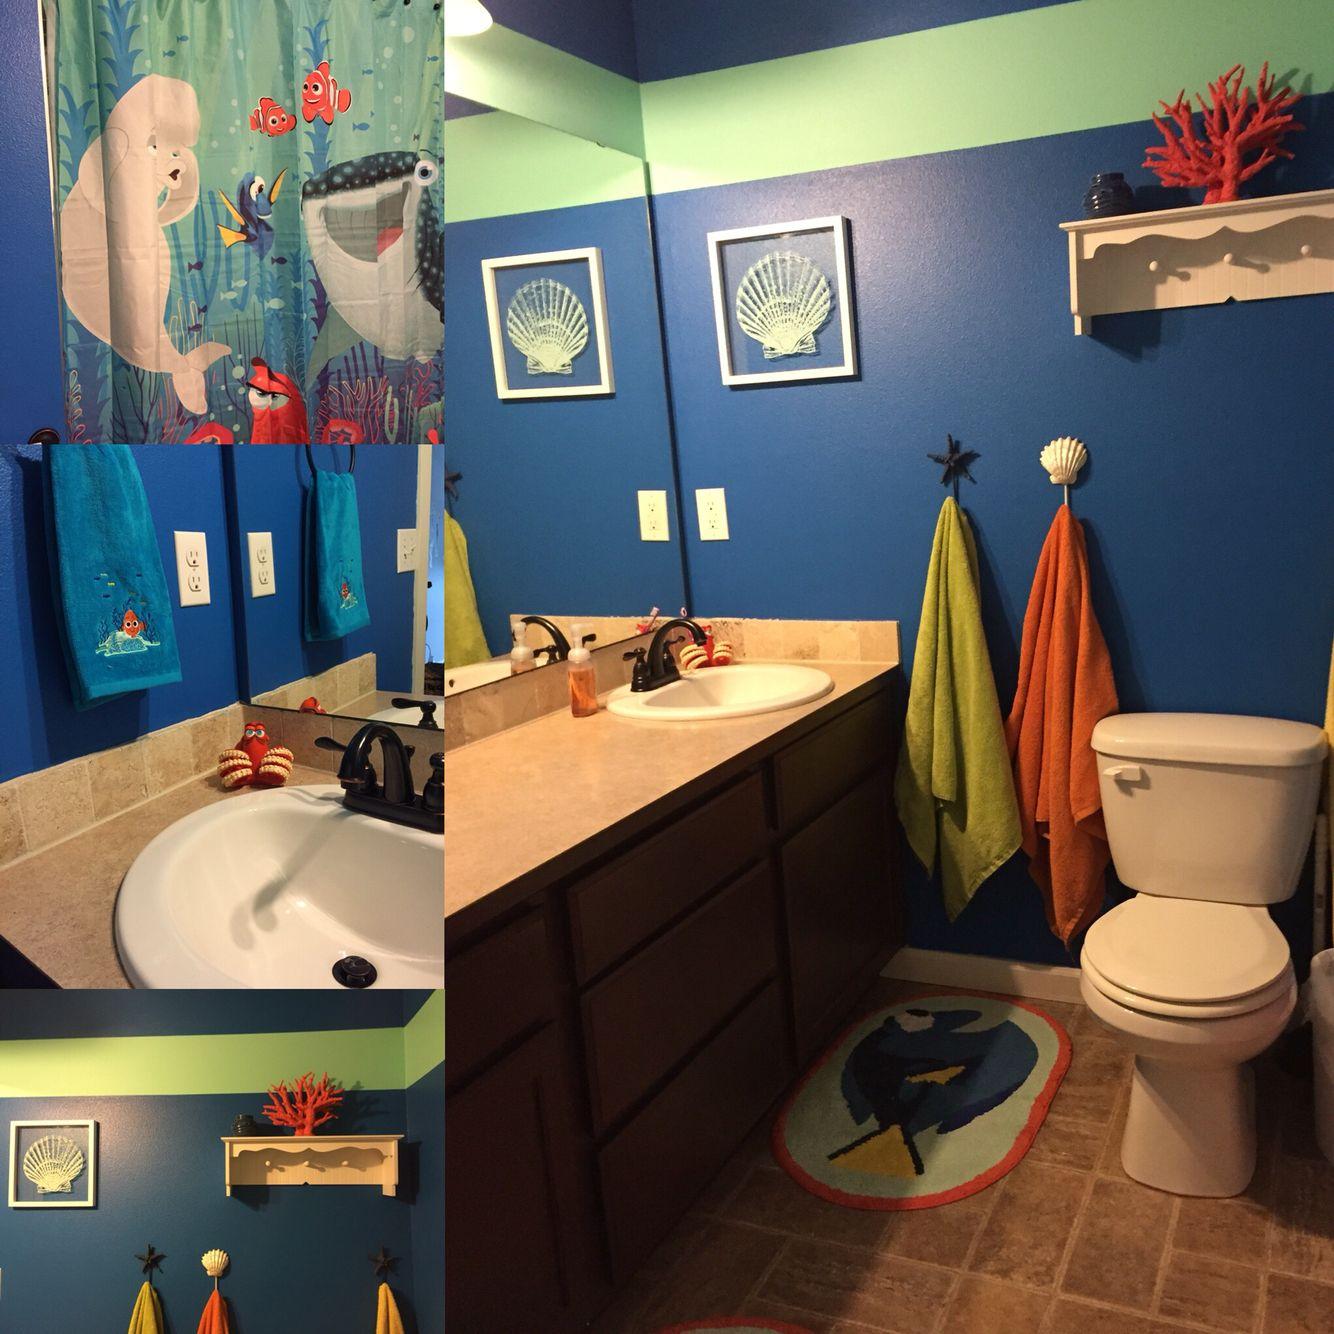 Finding Nemo Dory Bathroom Redo, Finding Nemo Bathroom Decor